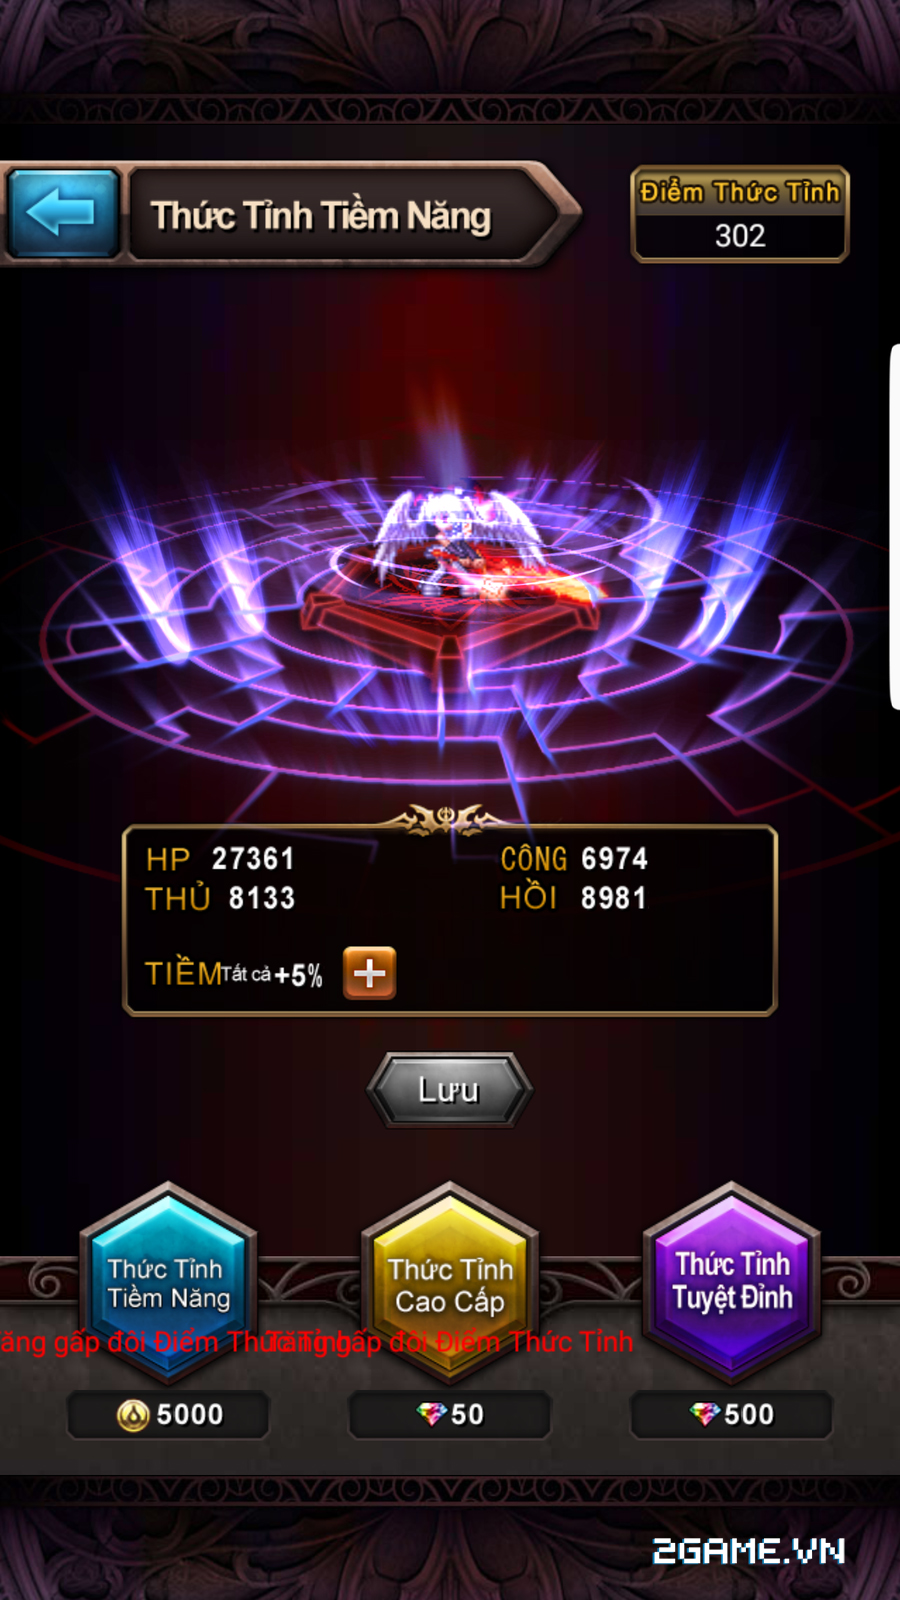 2game-Bloodline-viet-nam-mobile-5.jpg (900×1600)